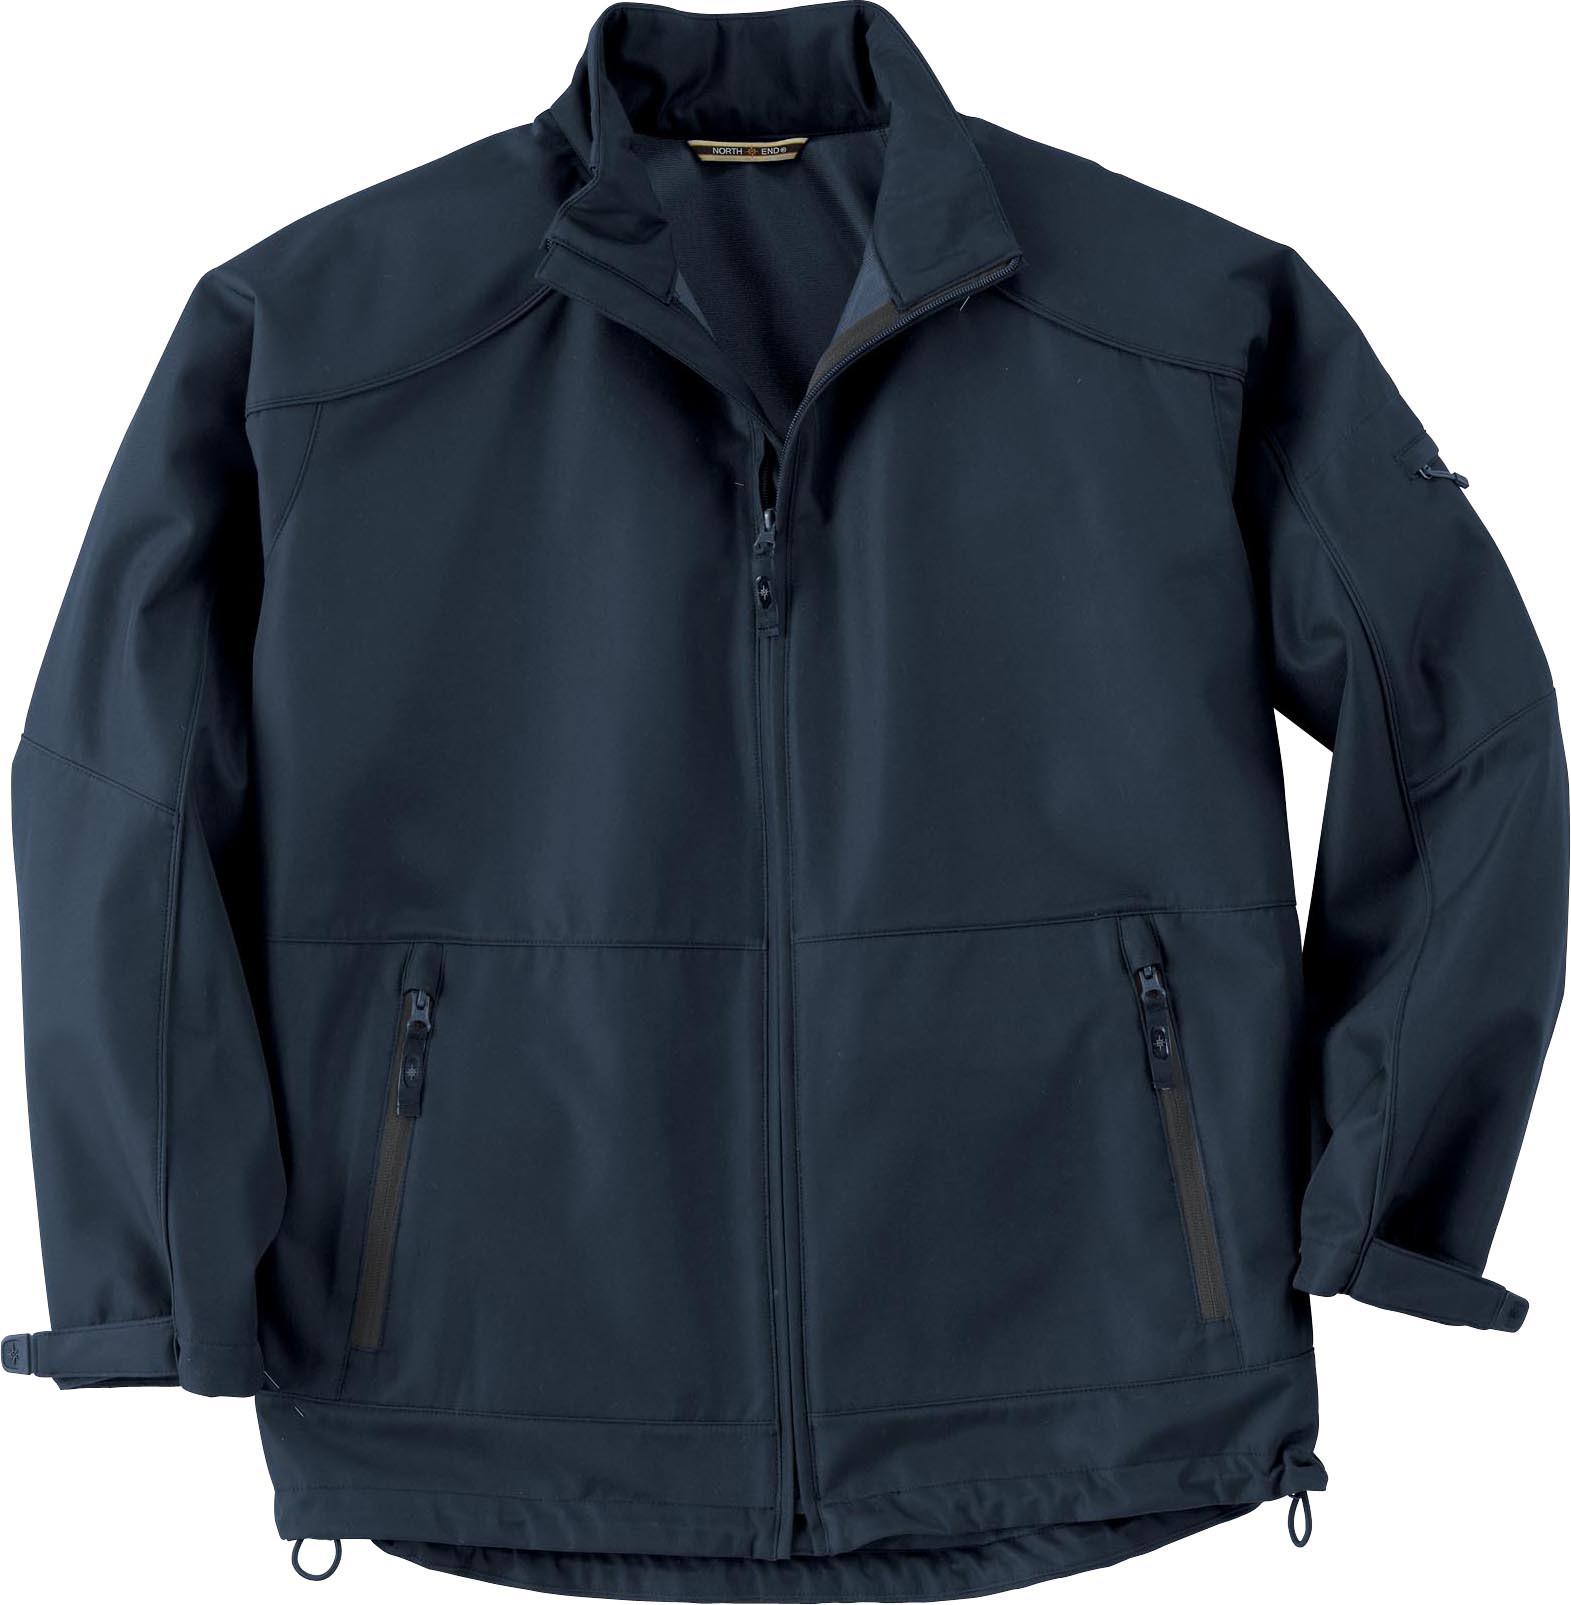 Ash City Performance Jackets 88121 - Men's Performance Mid-Length Soft Shell Jacket